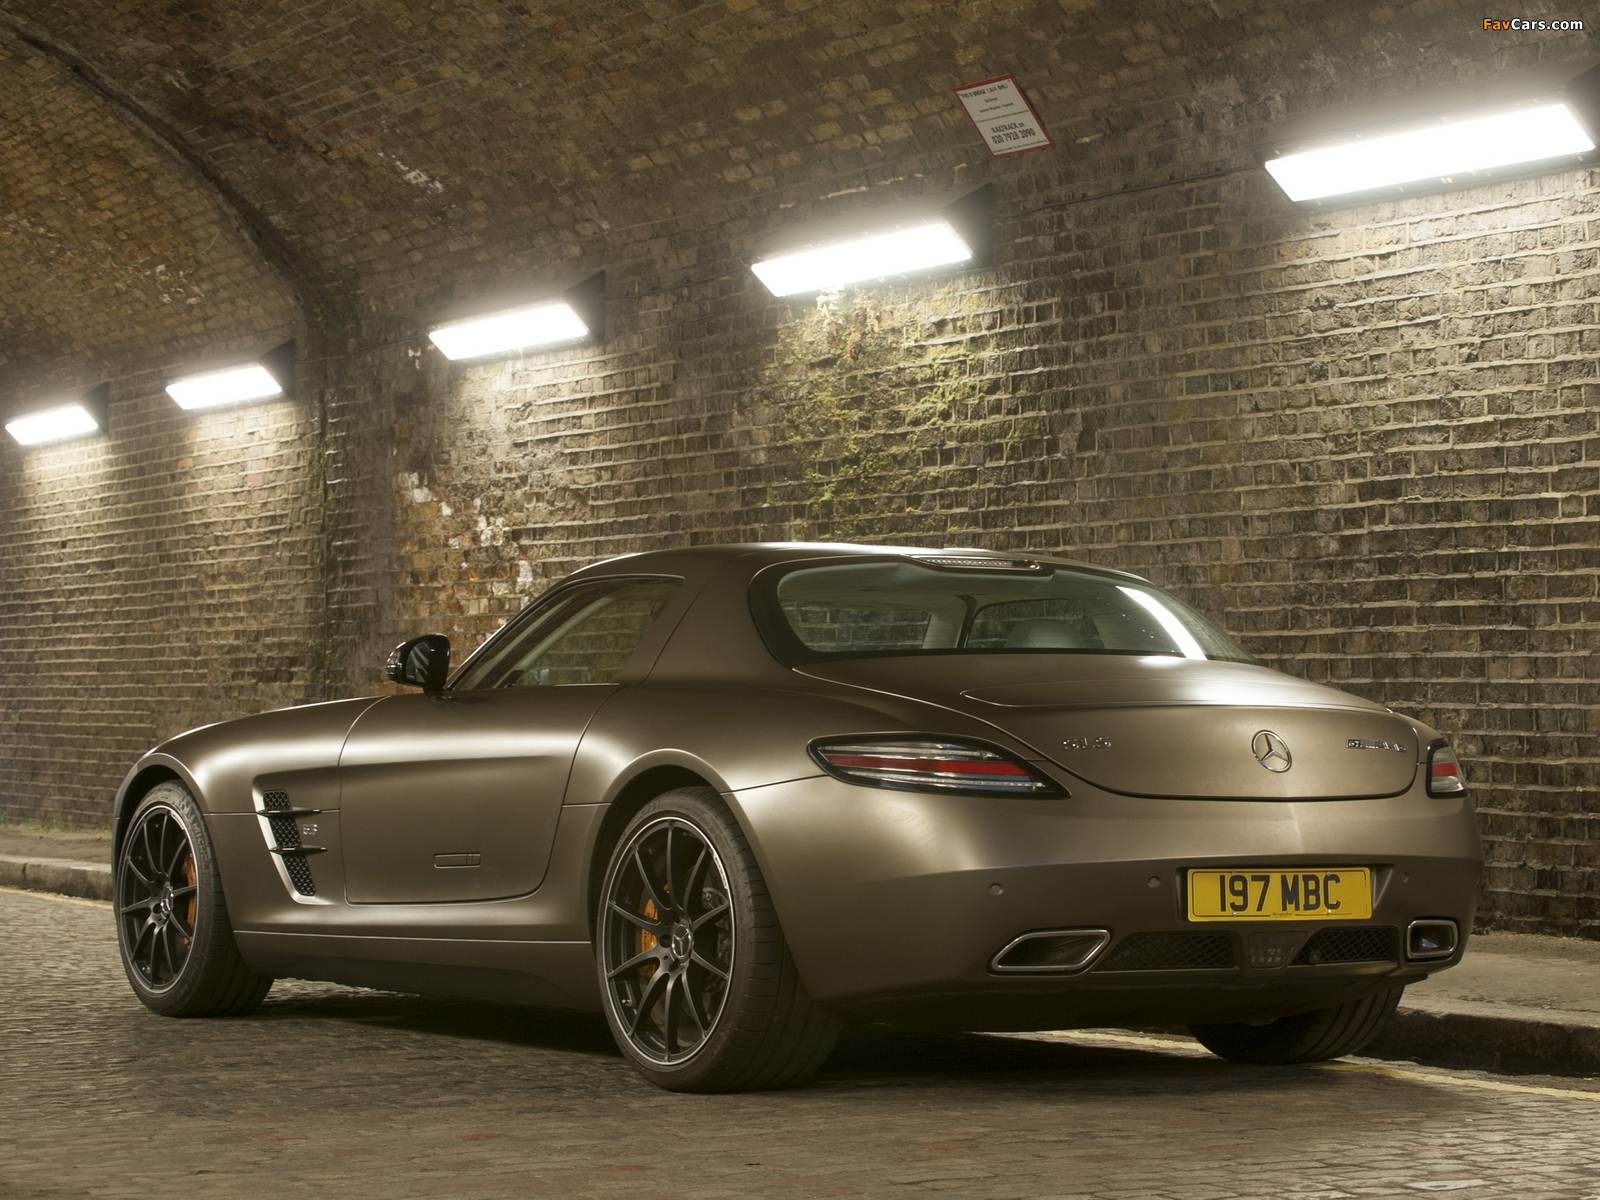 Mercedes-Benz SLS 63 AMG GT UK-spec (C197) 2012 wallpapers (1600 x 1200)